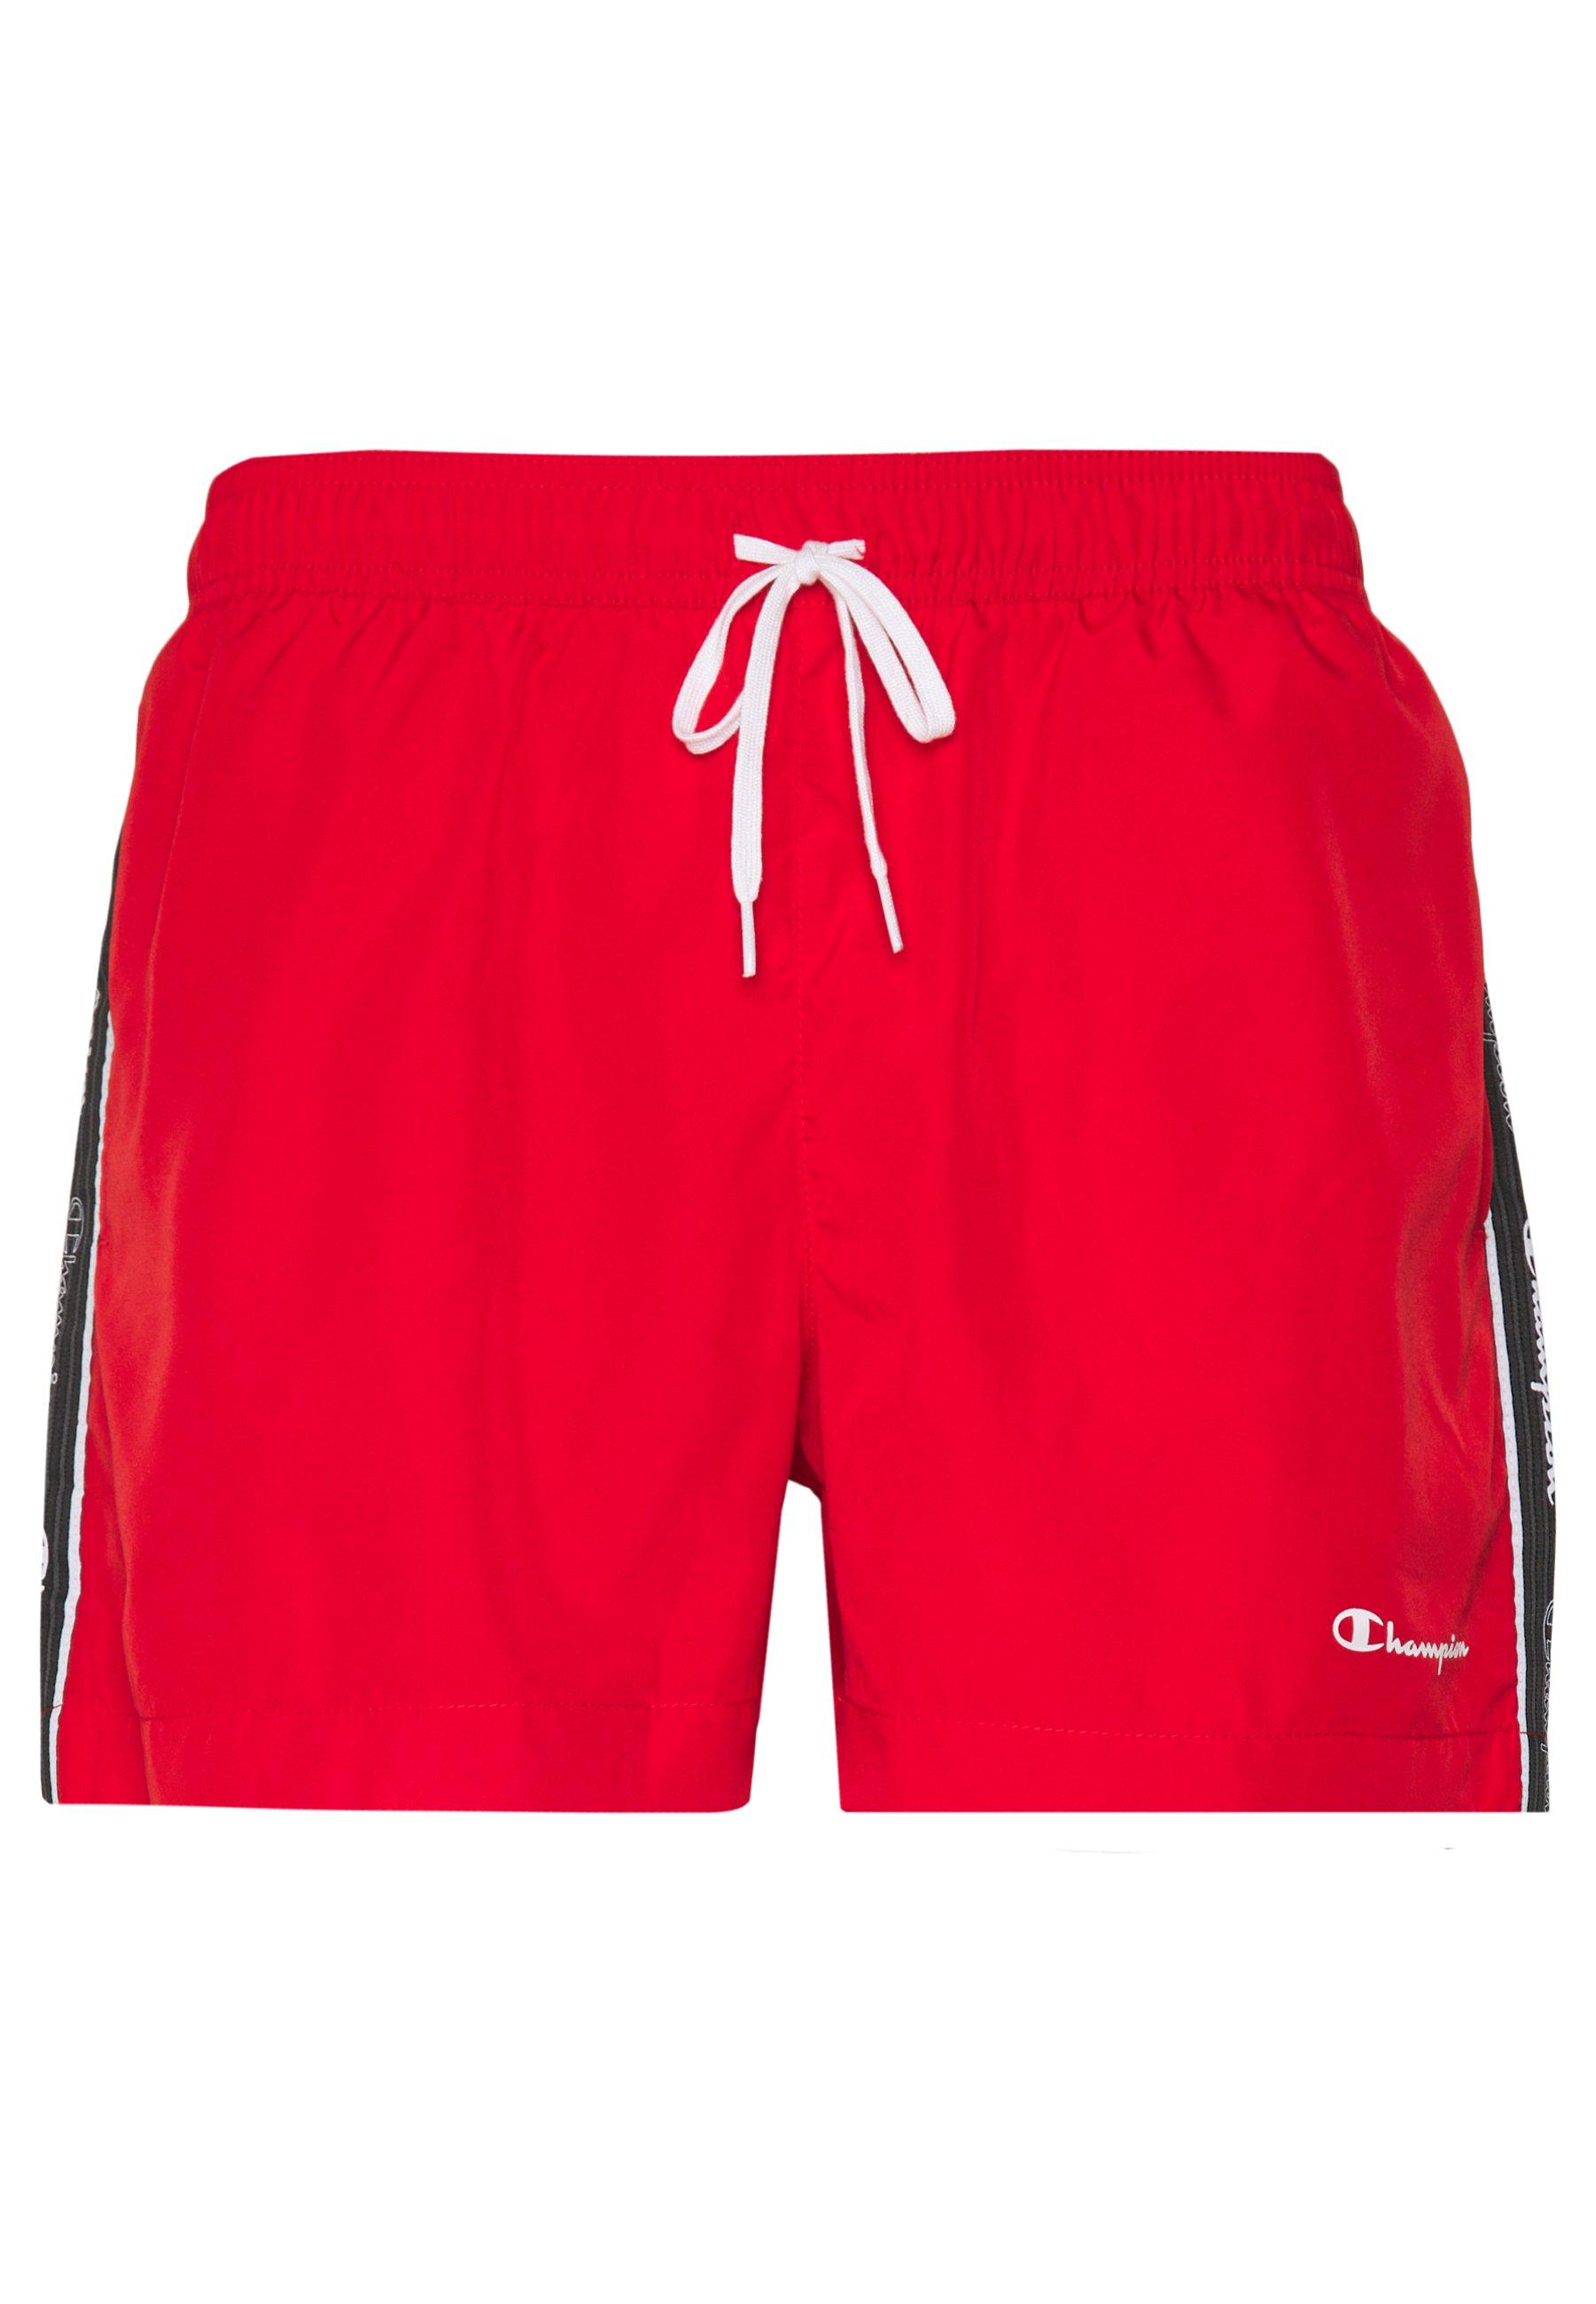 Slips & Shorts de bain homme   A commander chez Zalando